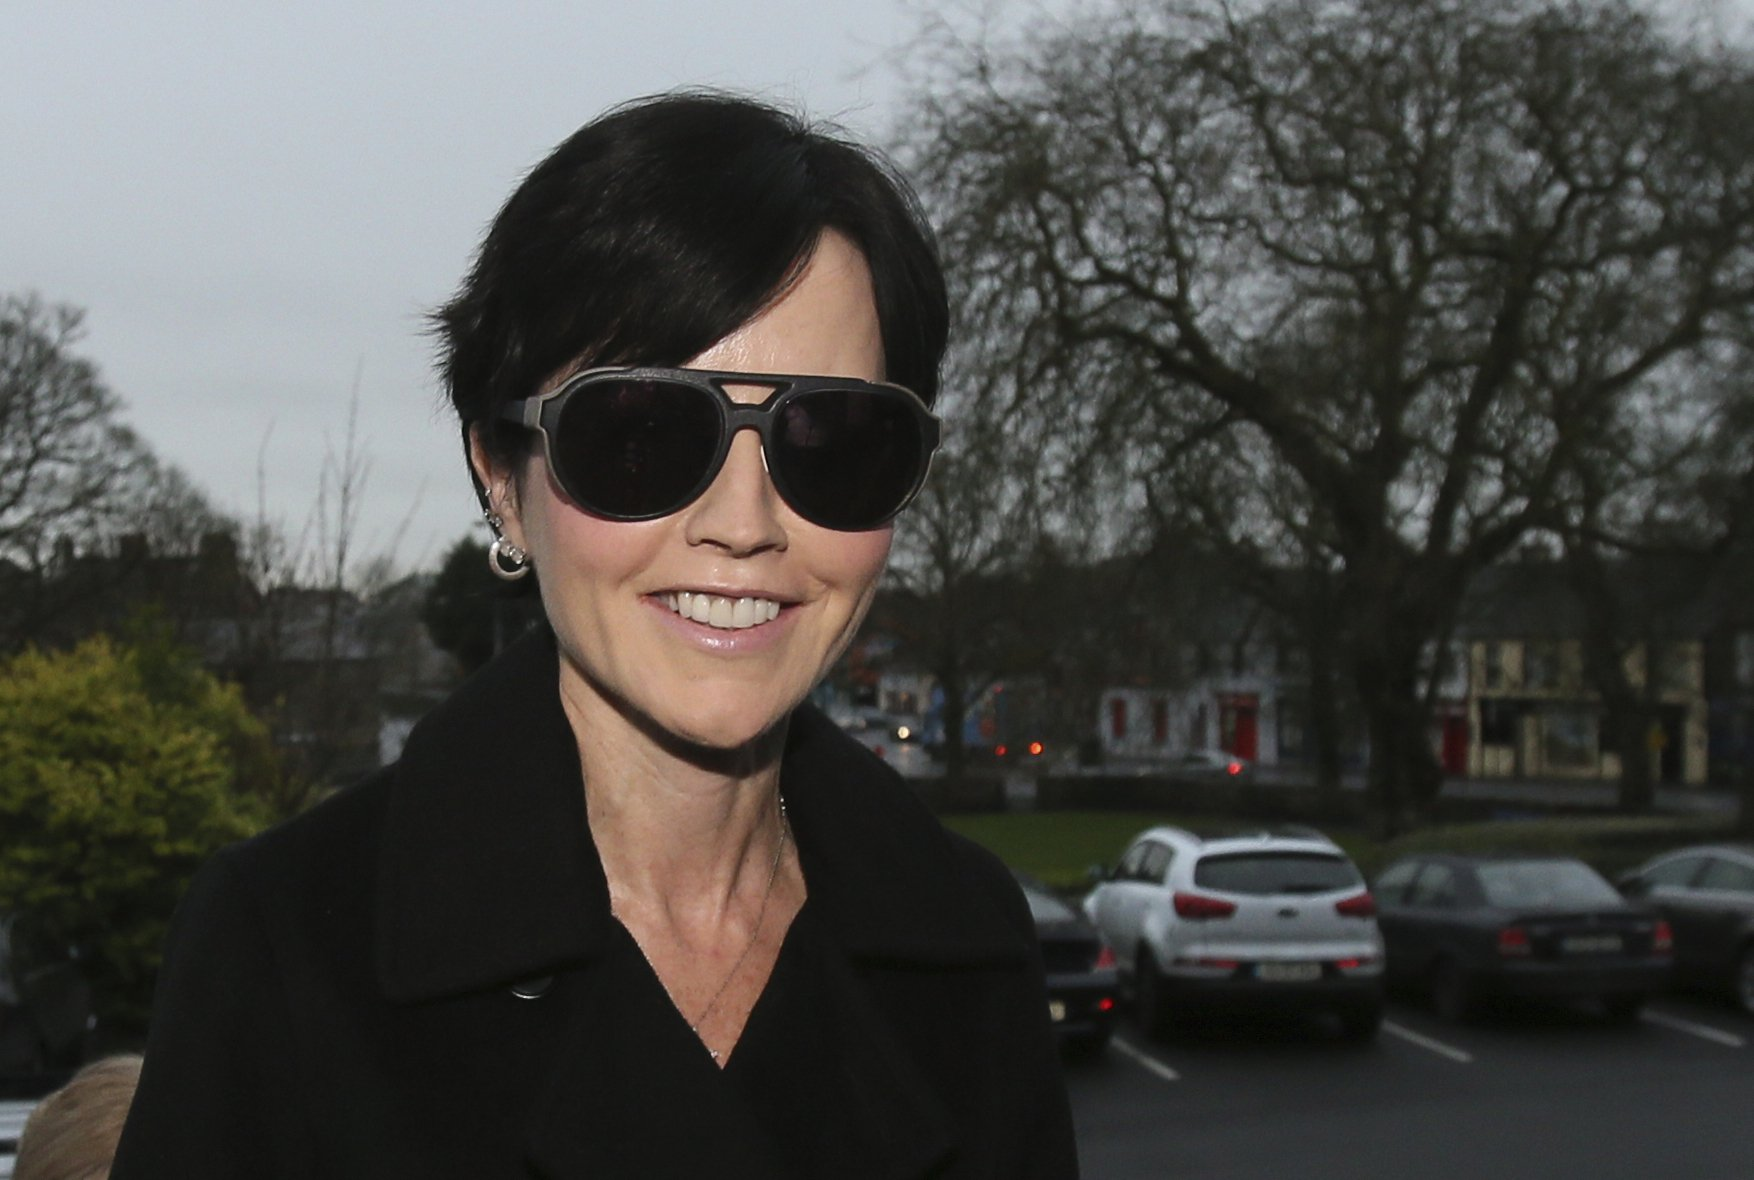 UK police say death of Dolores O'Riordan is not suspicious